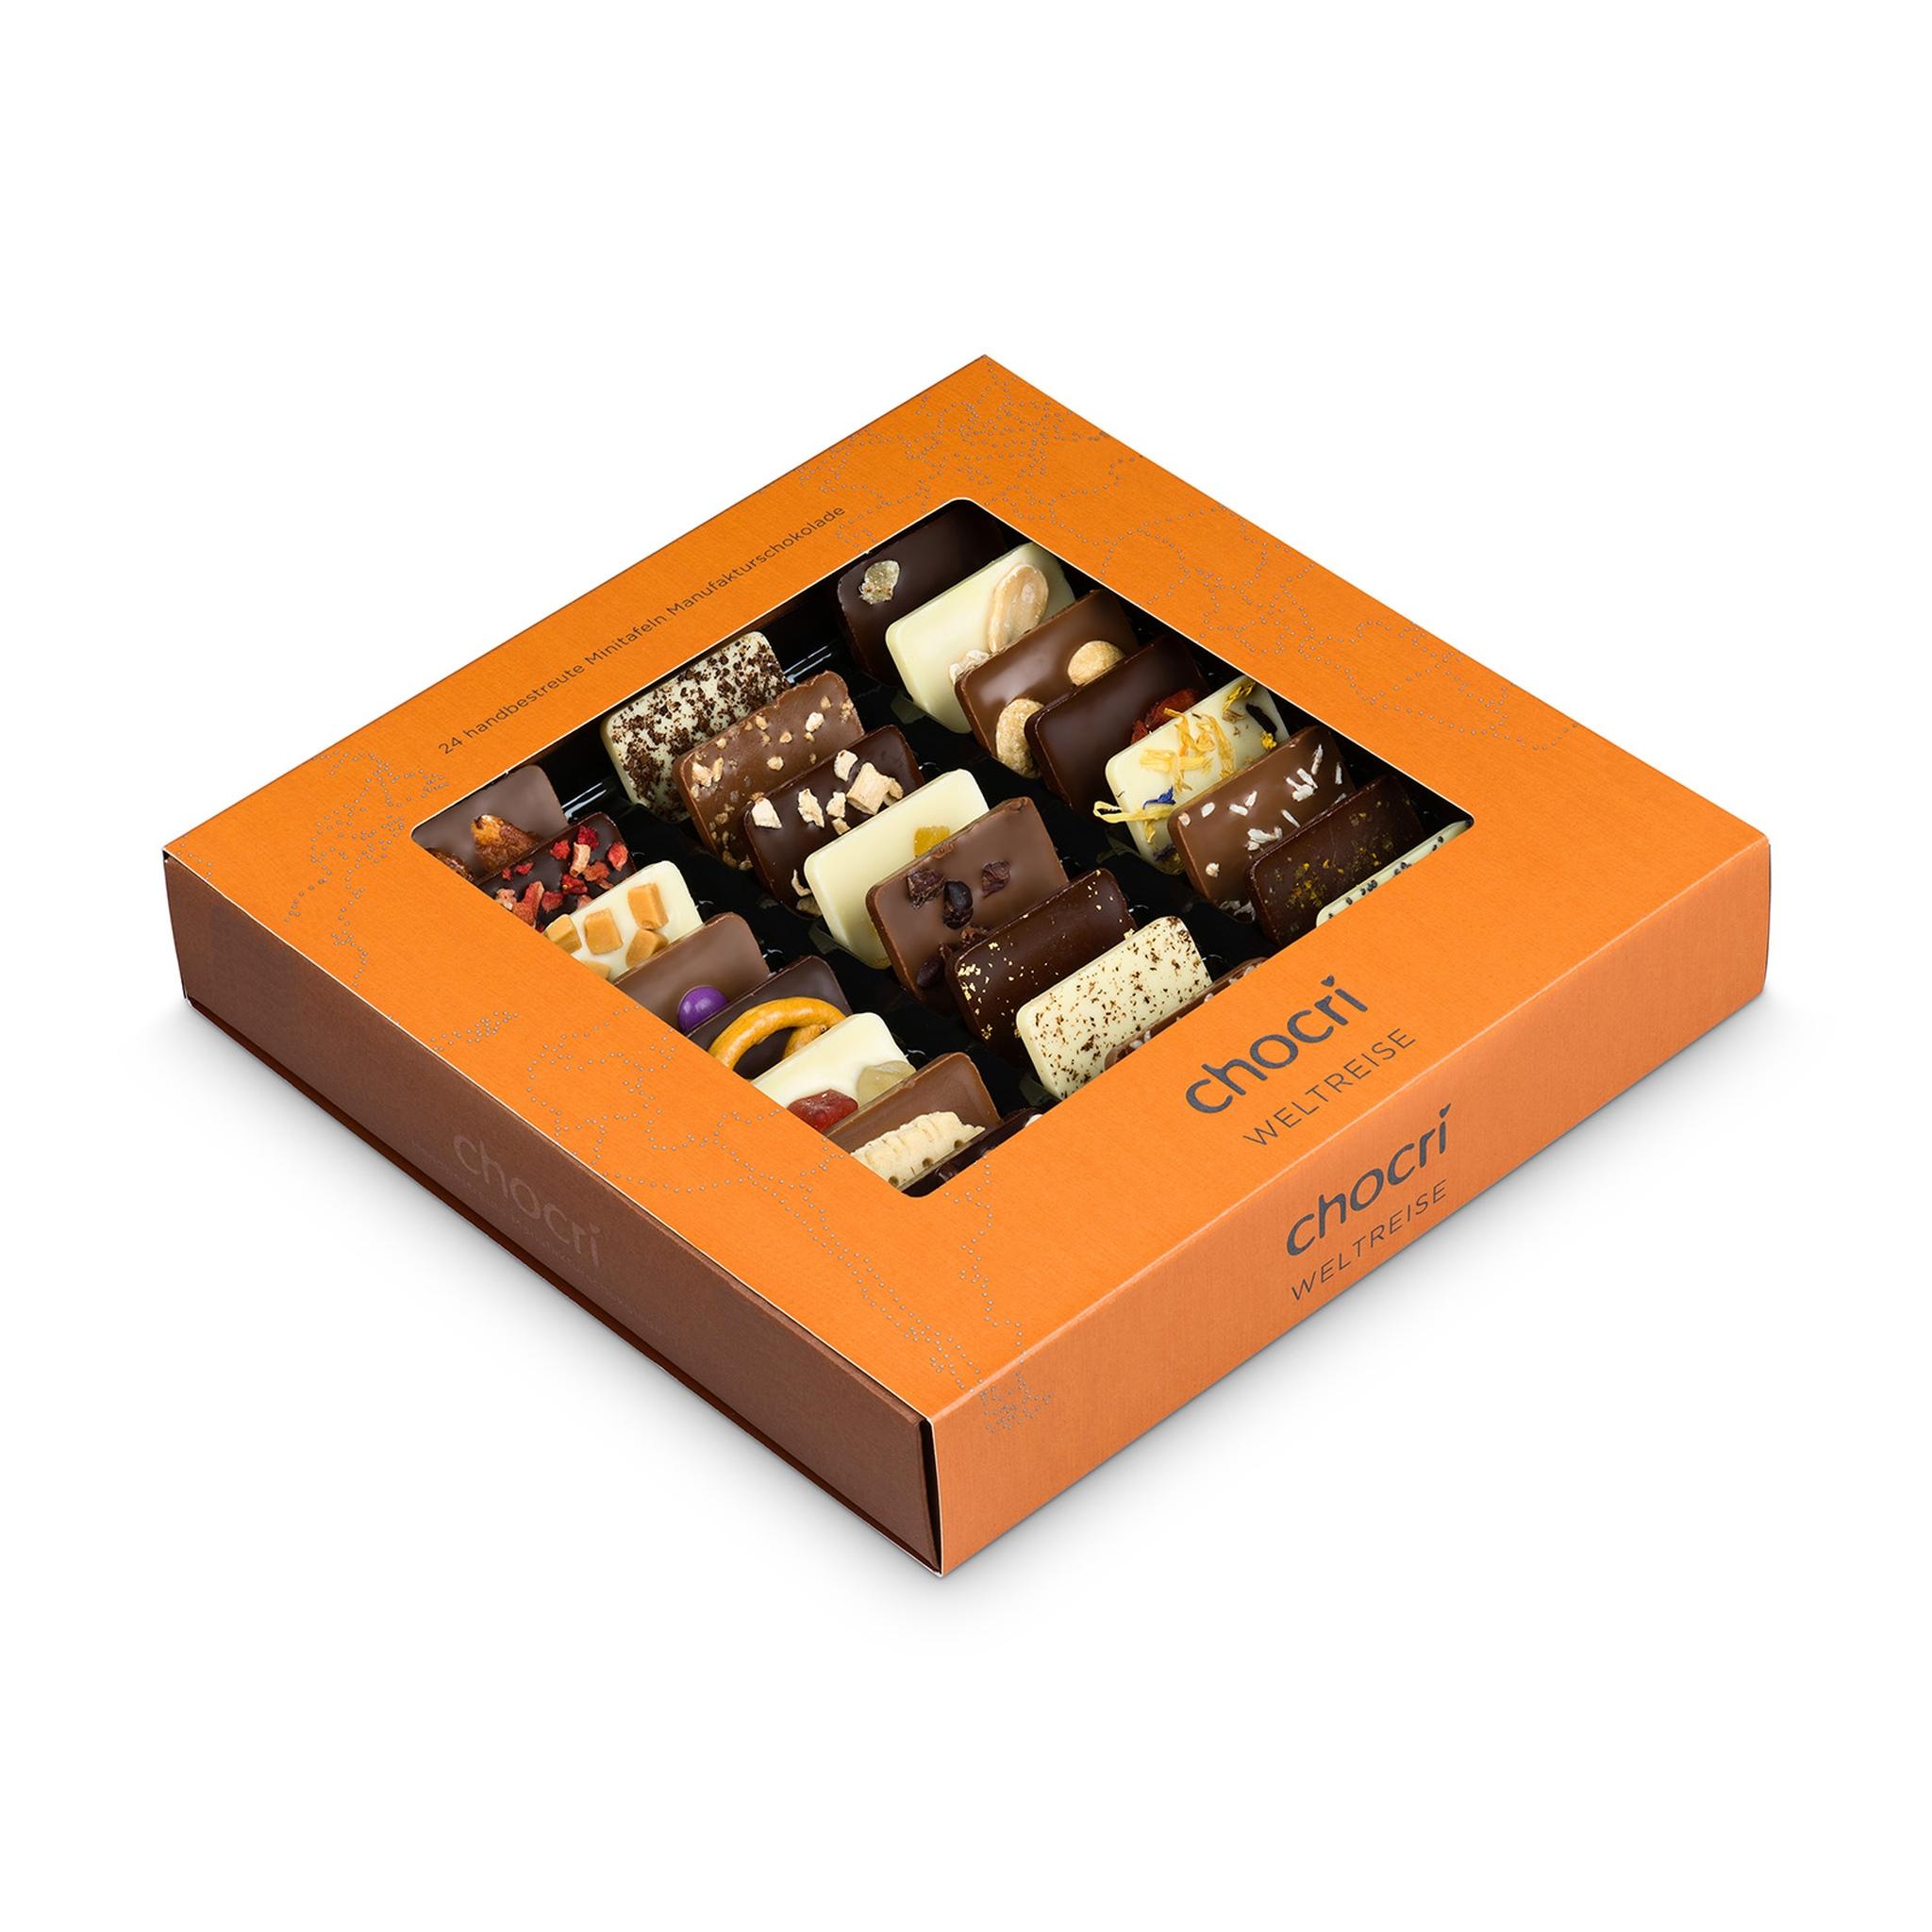 Köstlichsüsses - chocri Weltreise® 'Klassik' Mini Schokoladentafeln - Onlineshop Chocri